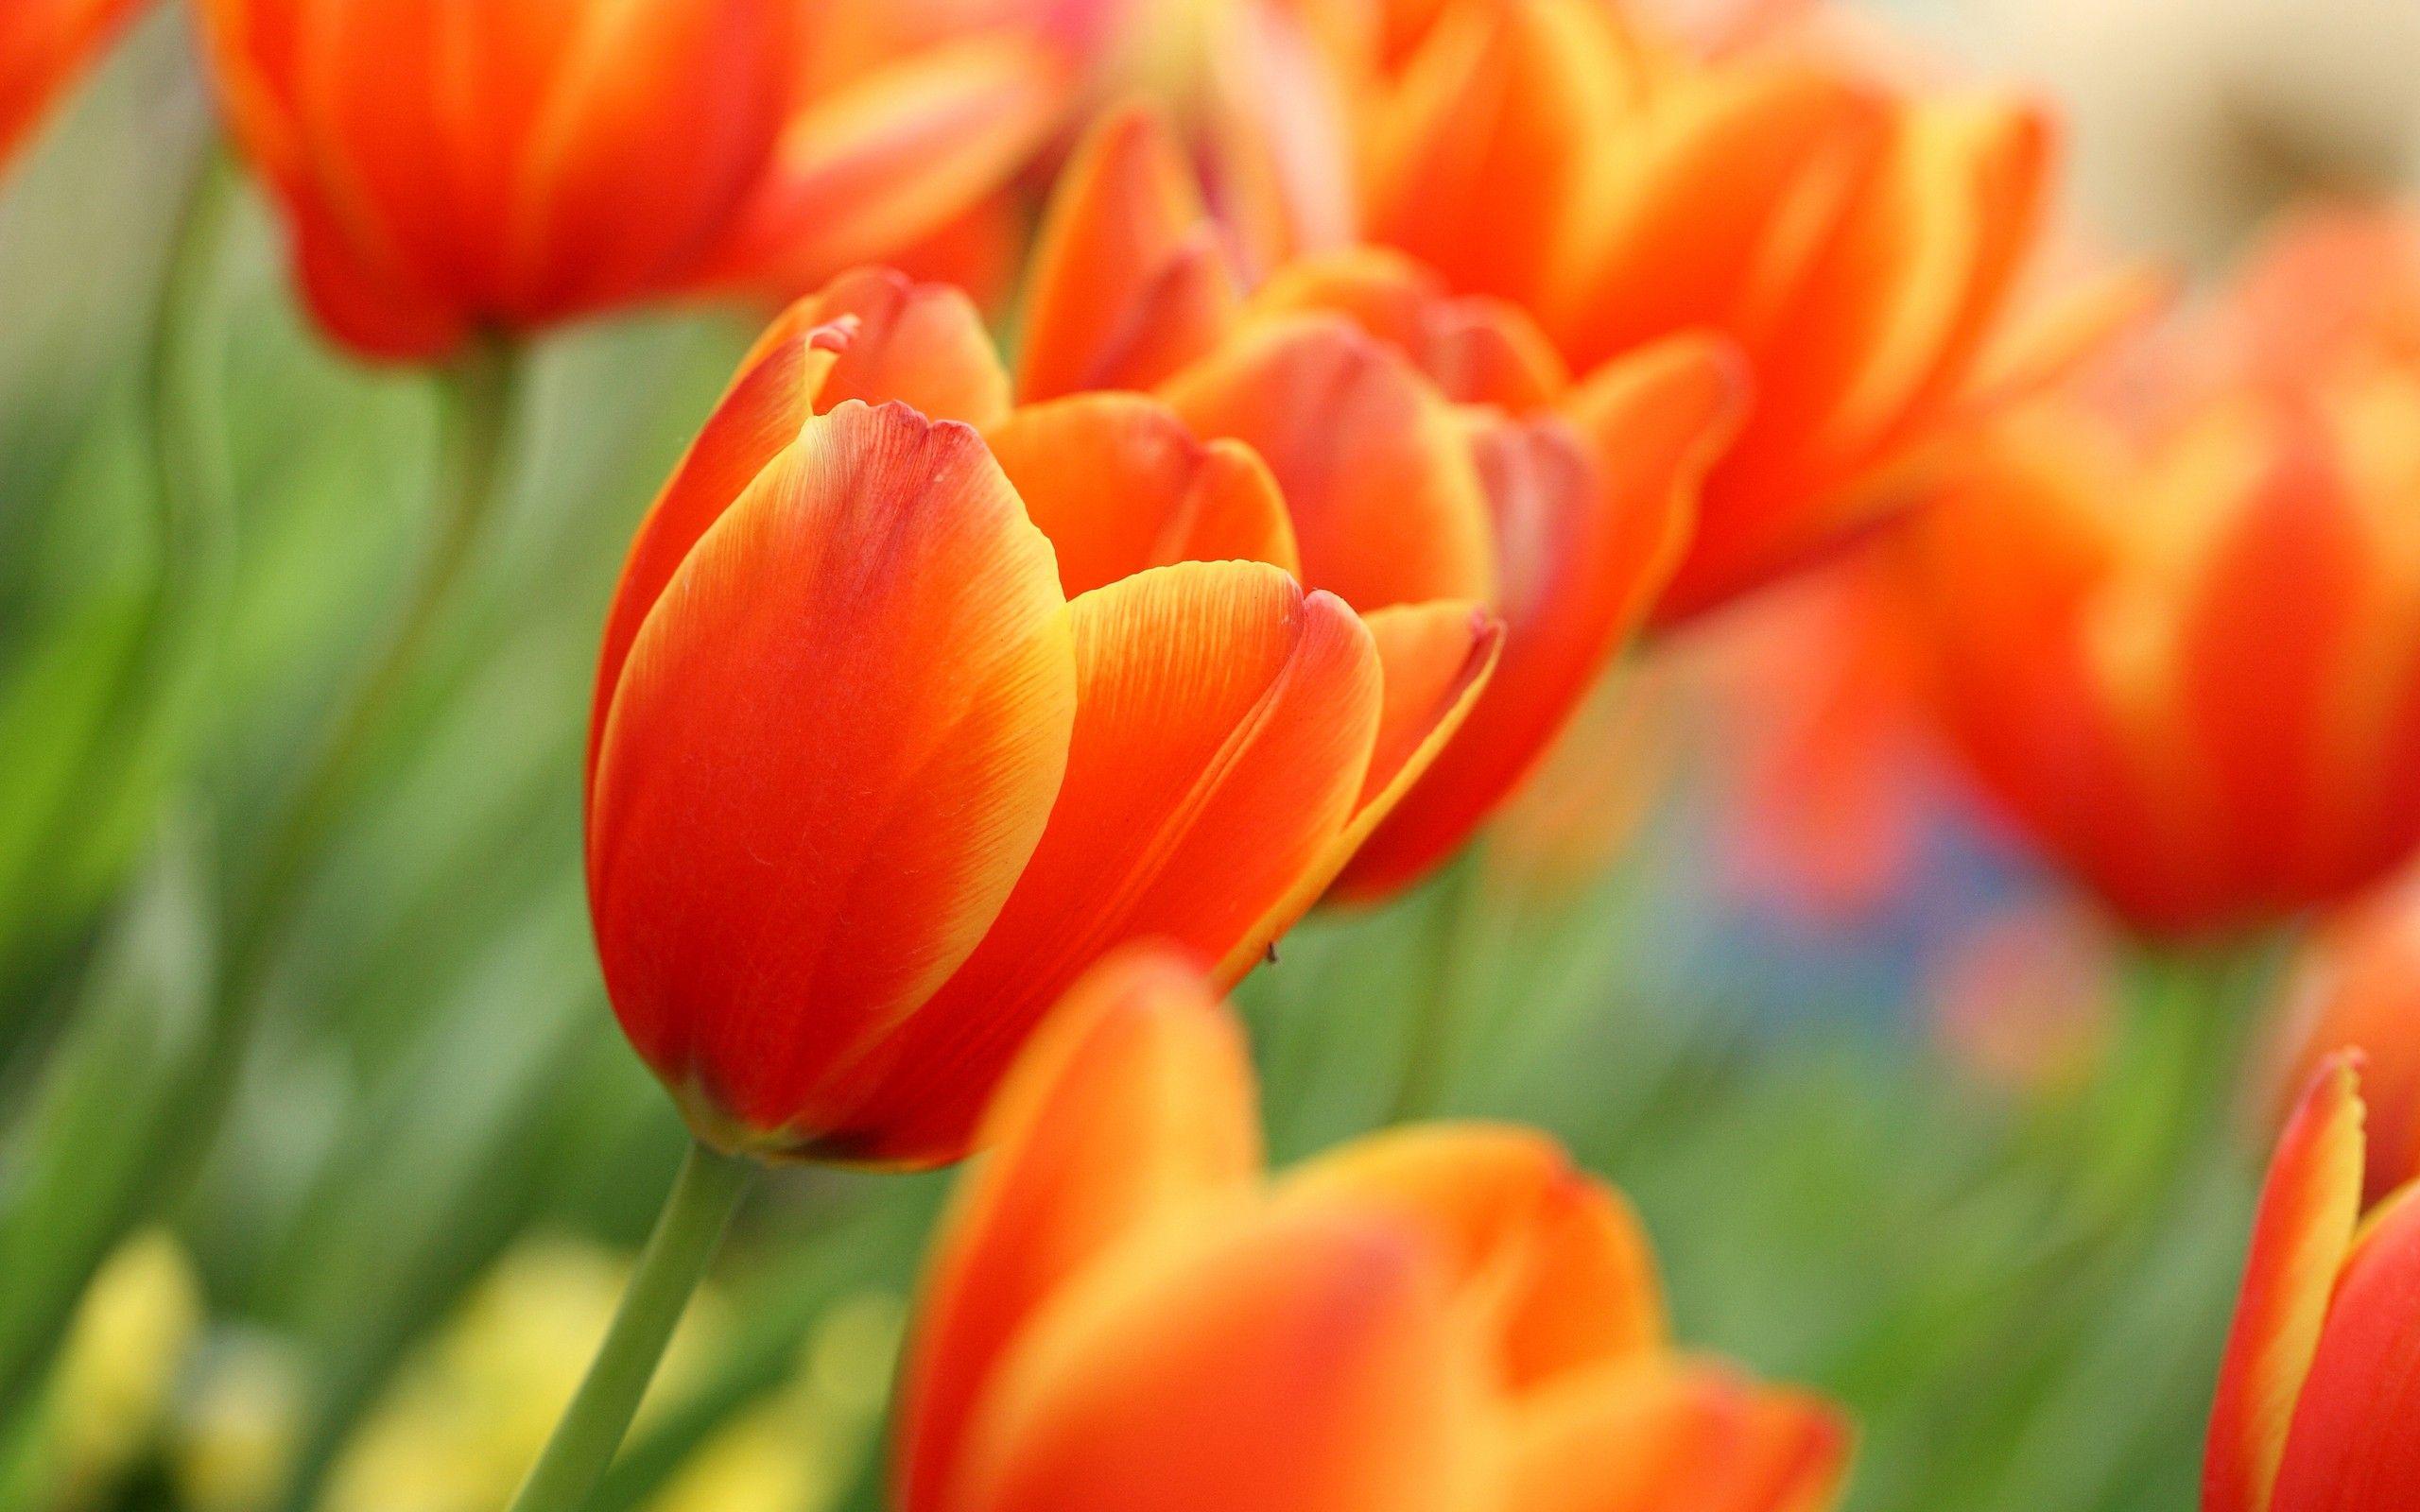 Tulips Tulips Flowers Beautiful Flowers Pictures Orange Tulips